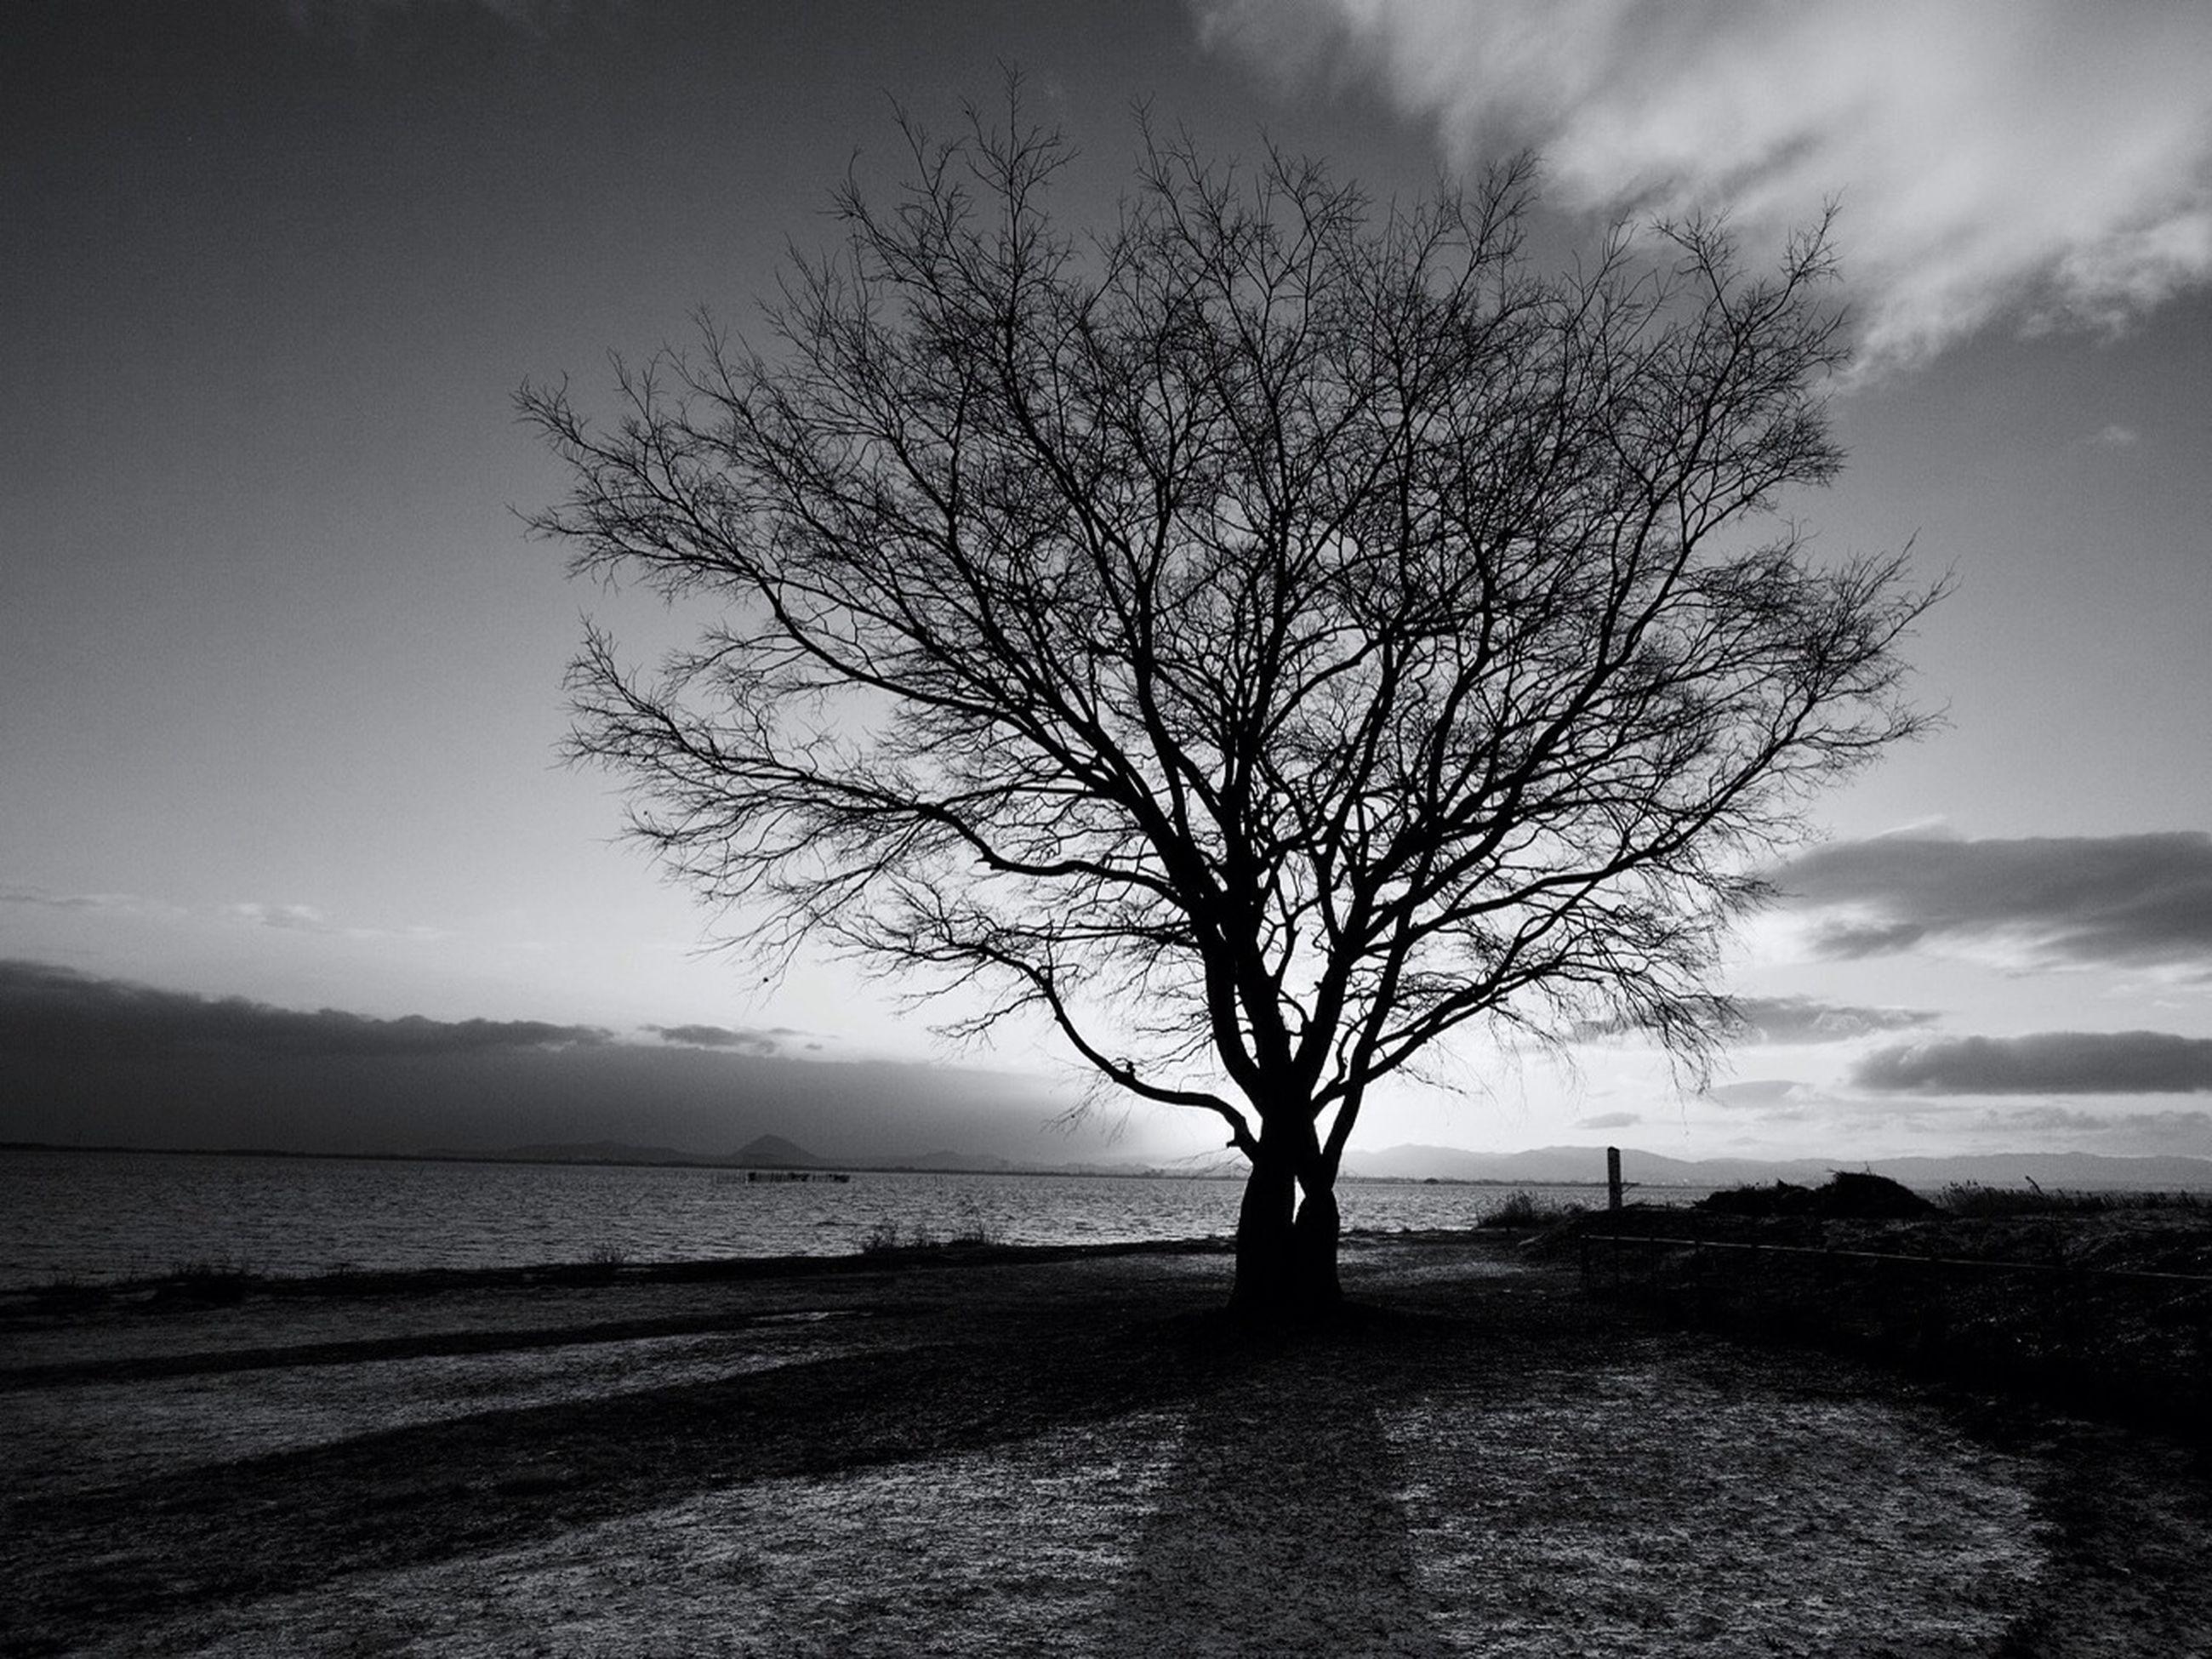 sky, tree, tranquility, tranquil scene, scenics, bare tree, beauty in nature, branch, nature, water, cloud - sky, landscape, sea, cloud, tree trunk, single tree, silhouette, idyllic, horizon over water, non-urban scene